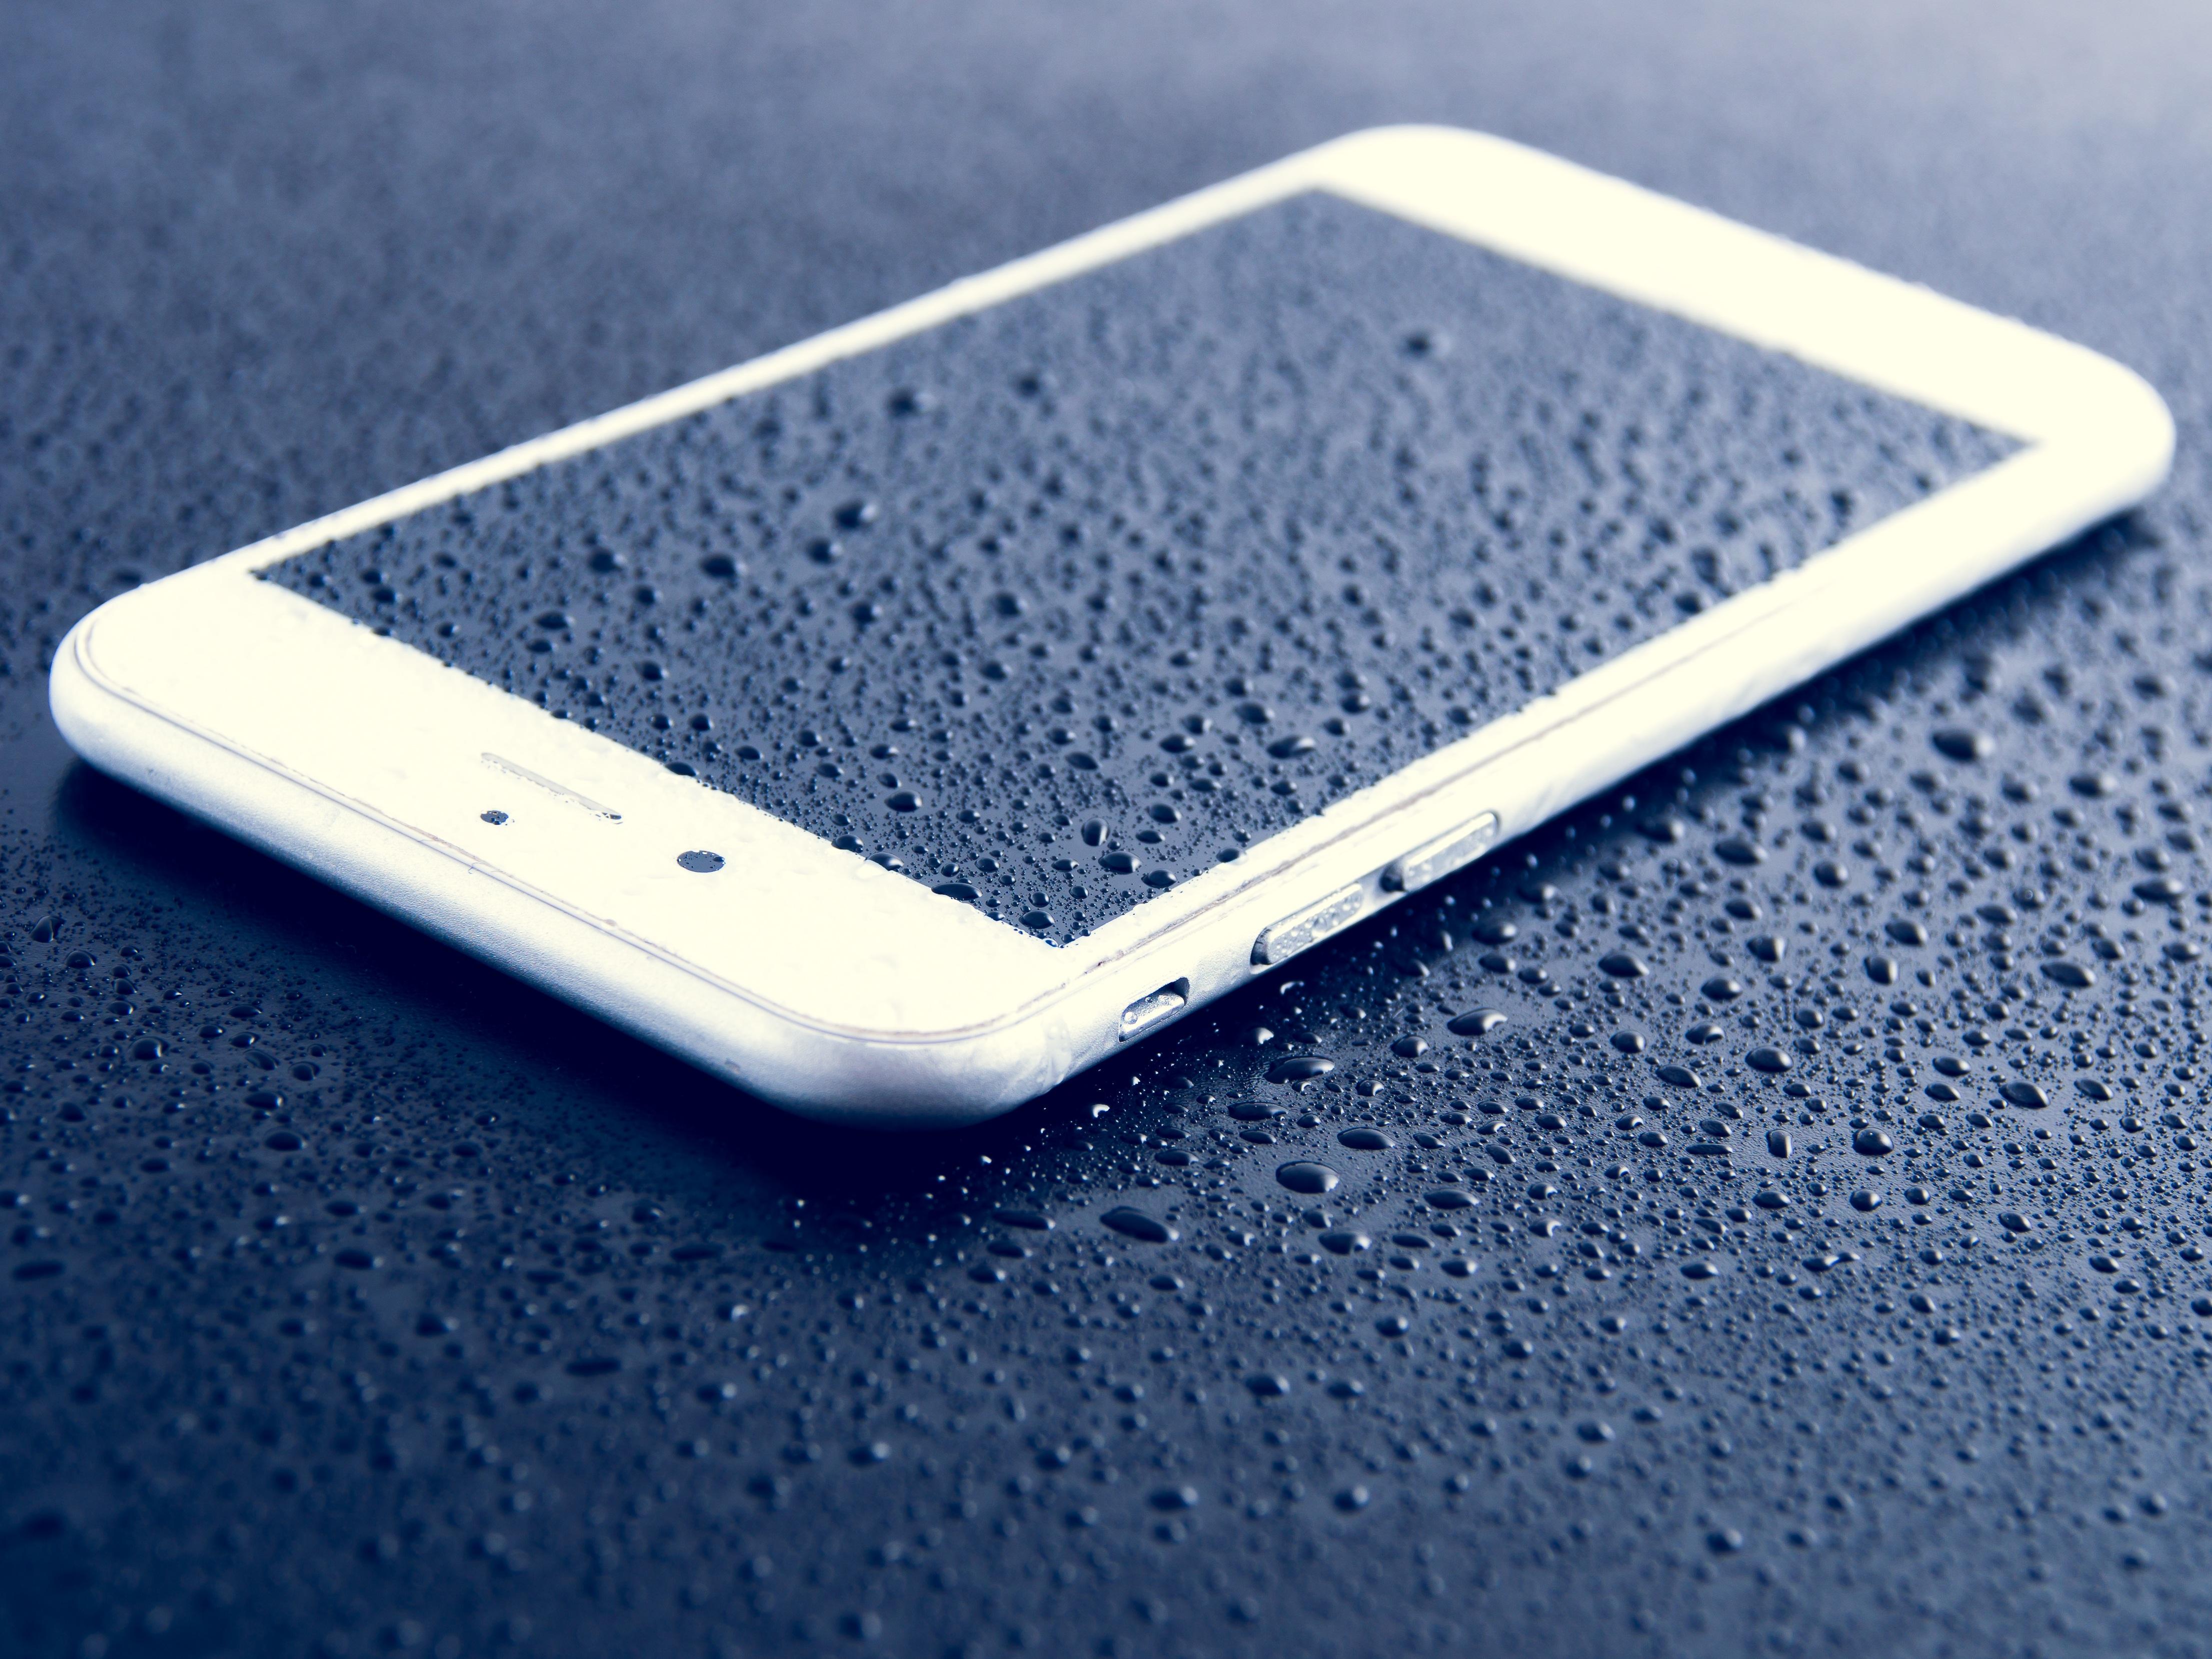 ios 7 wallpaper iphone 5 download